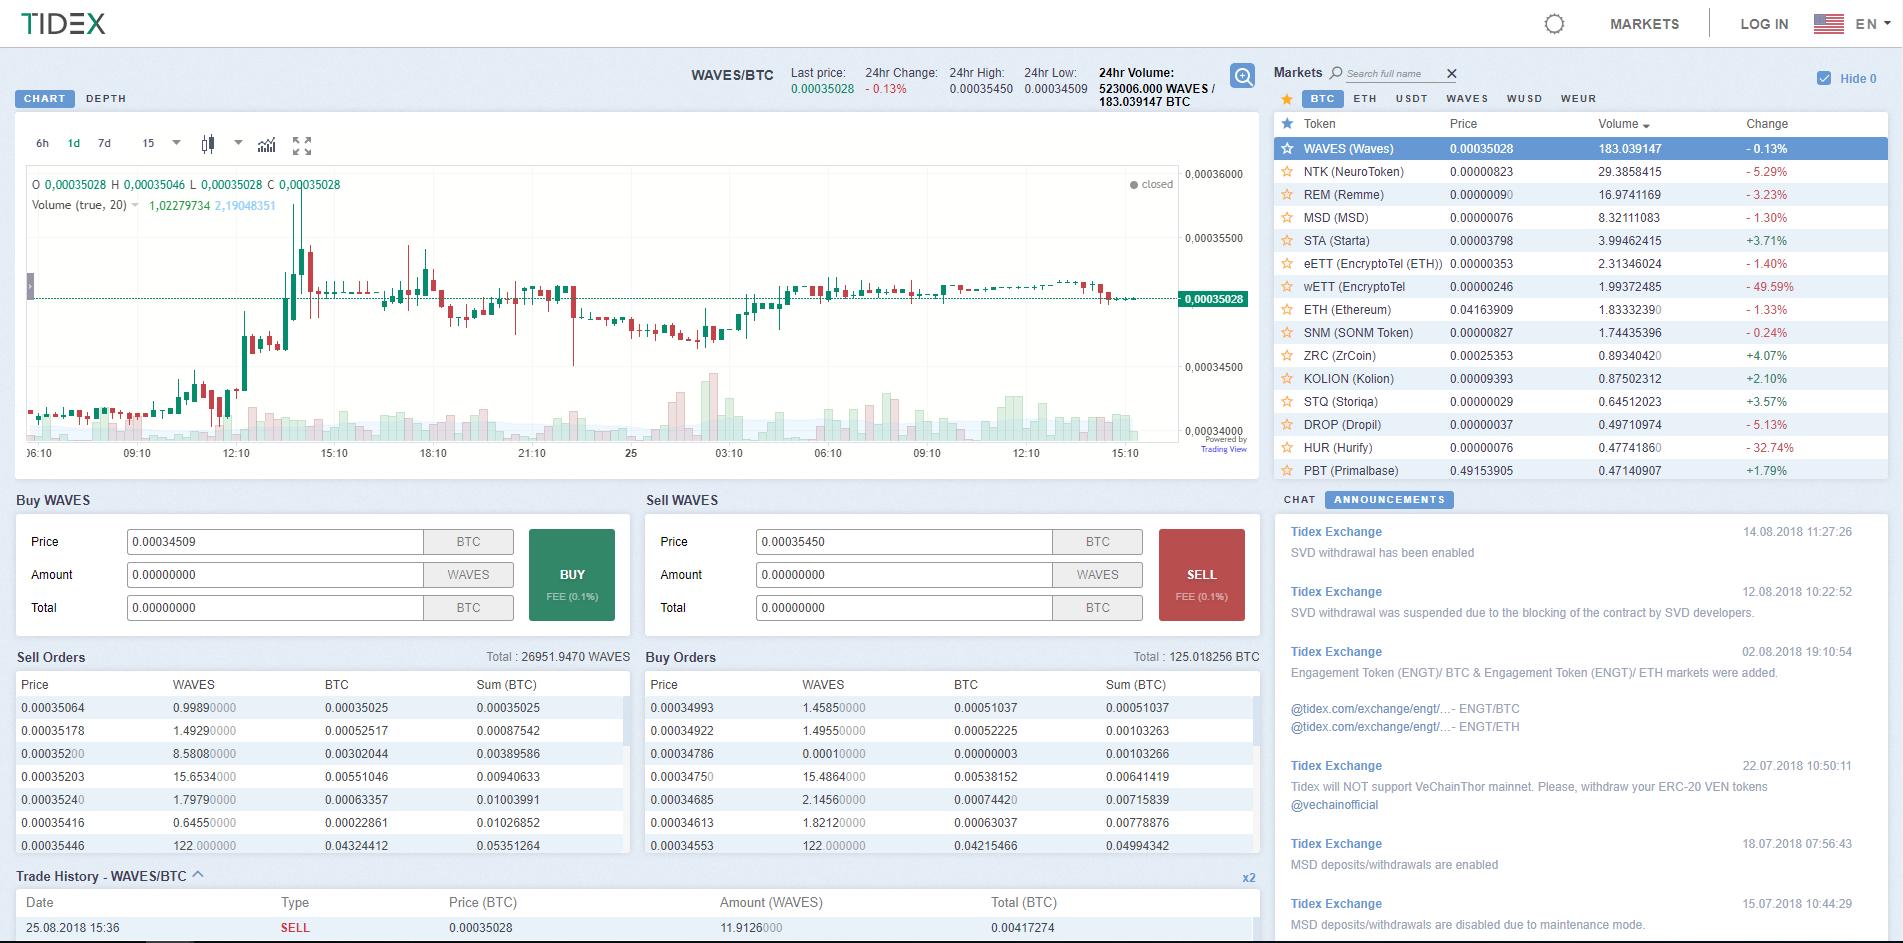 Tidex Trading View